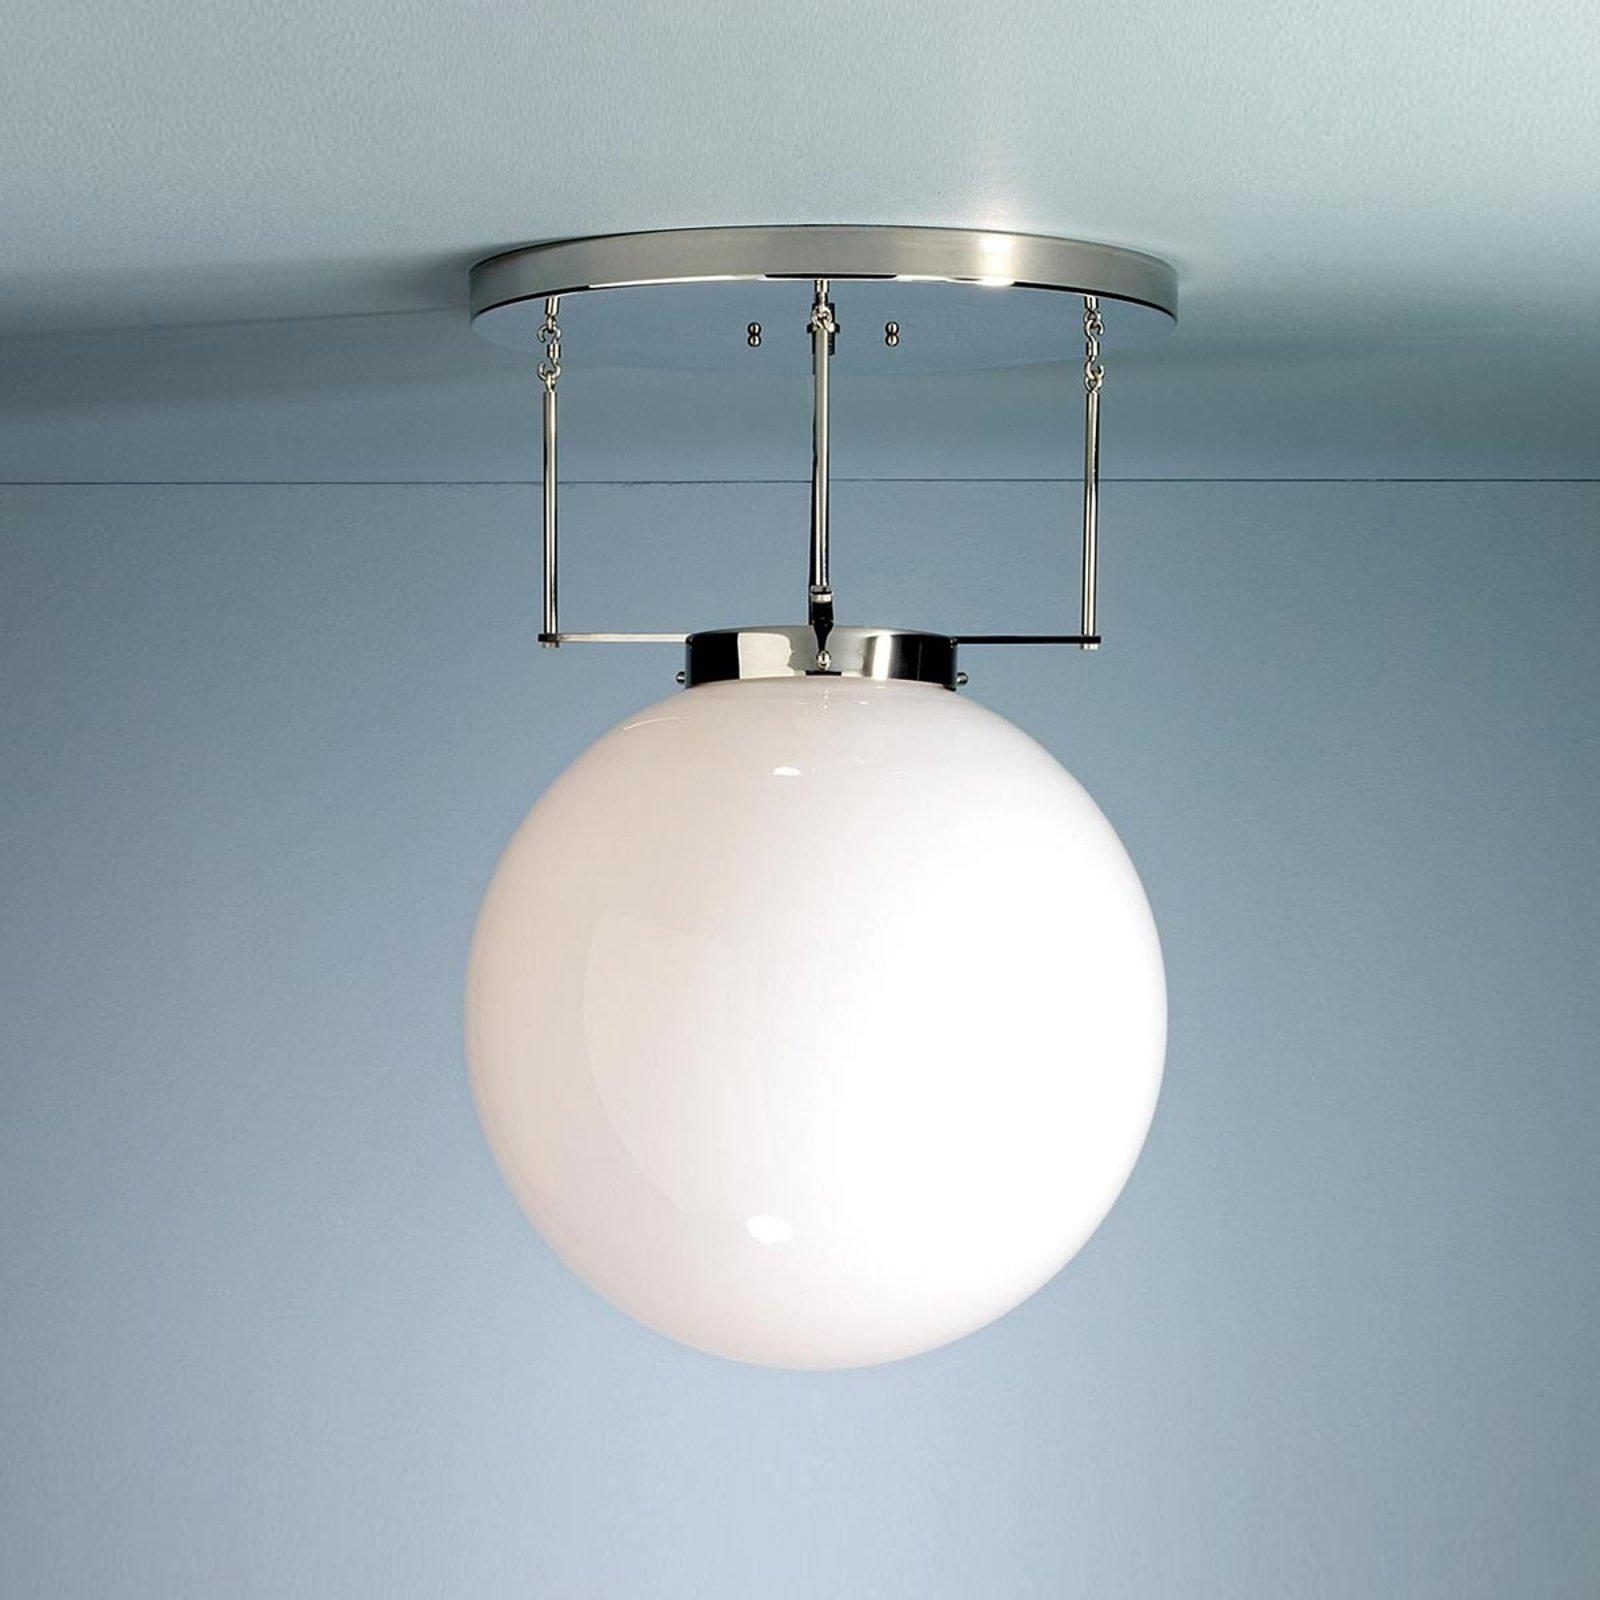 Brandts taklampe i Bauhaus-stil nikkel 30 cm